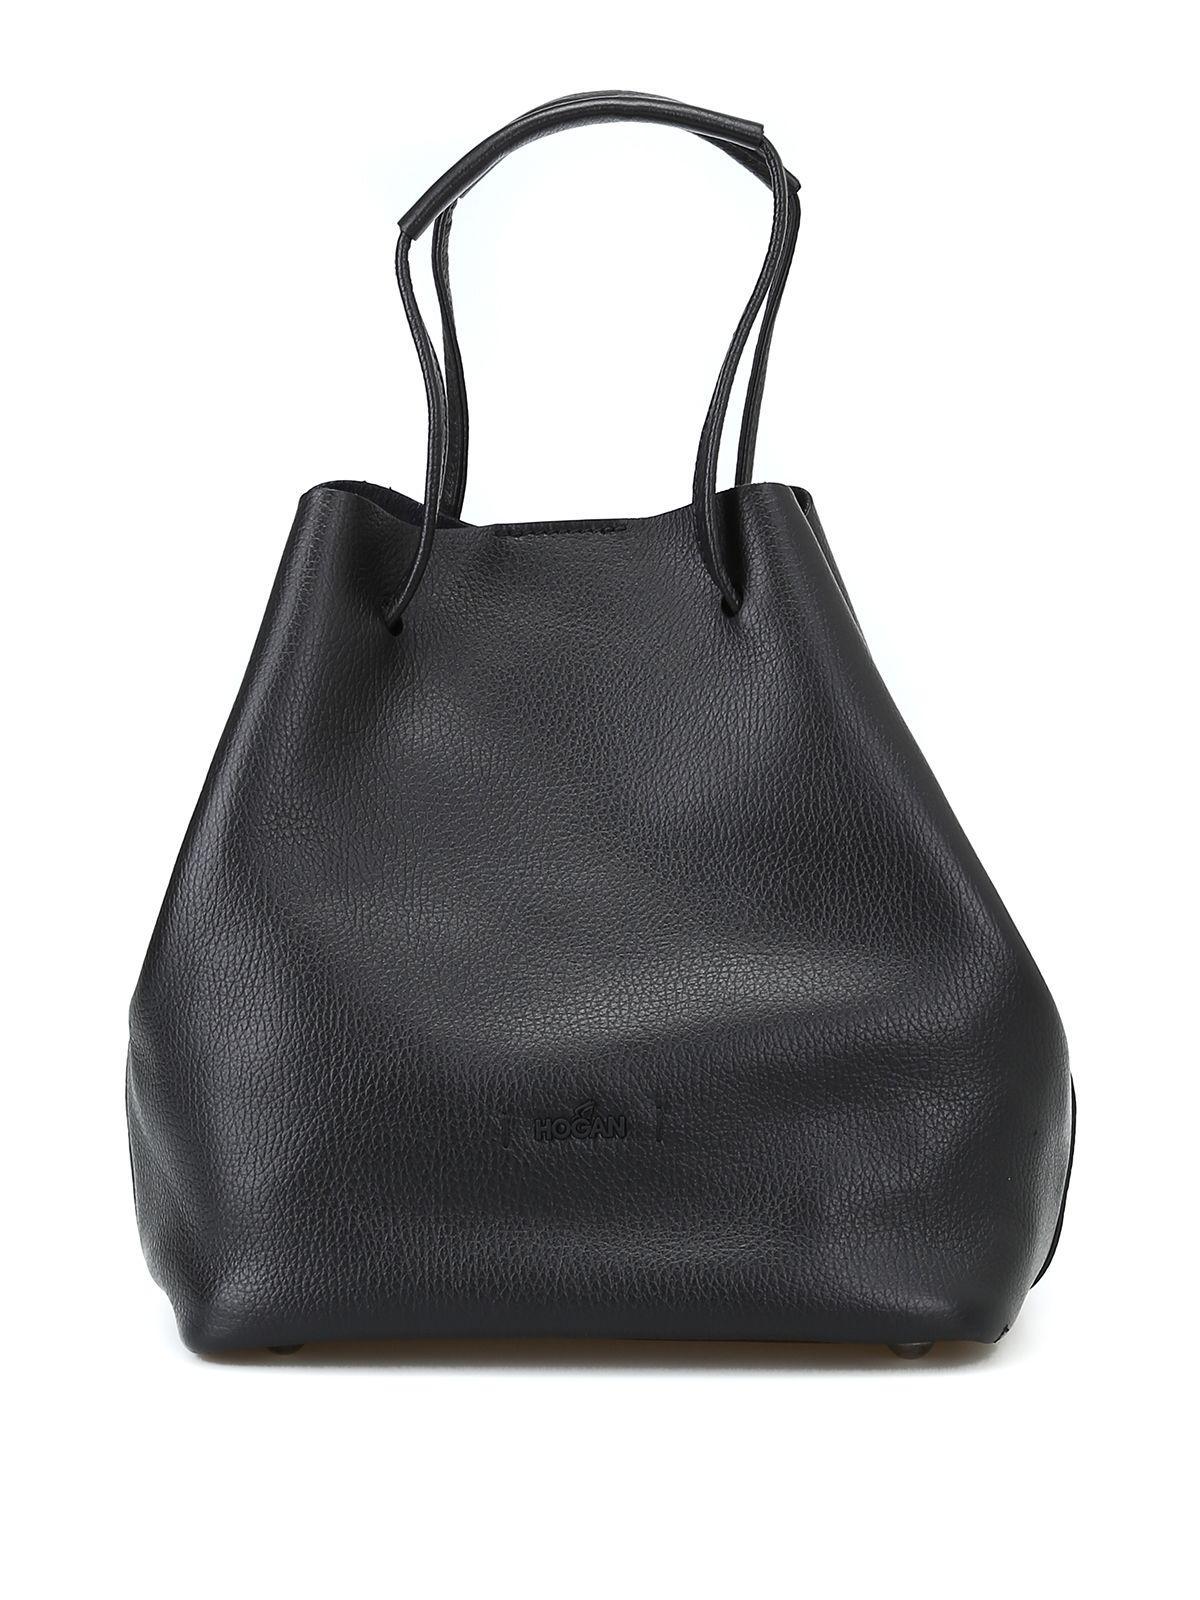 Hogan Bucket Bag In Black